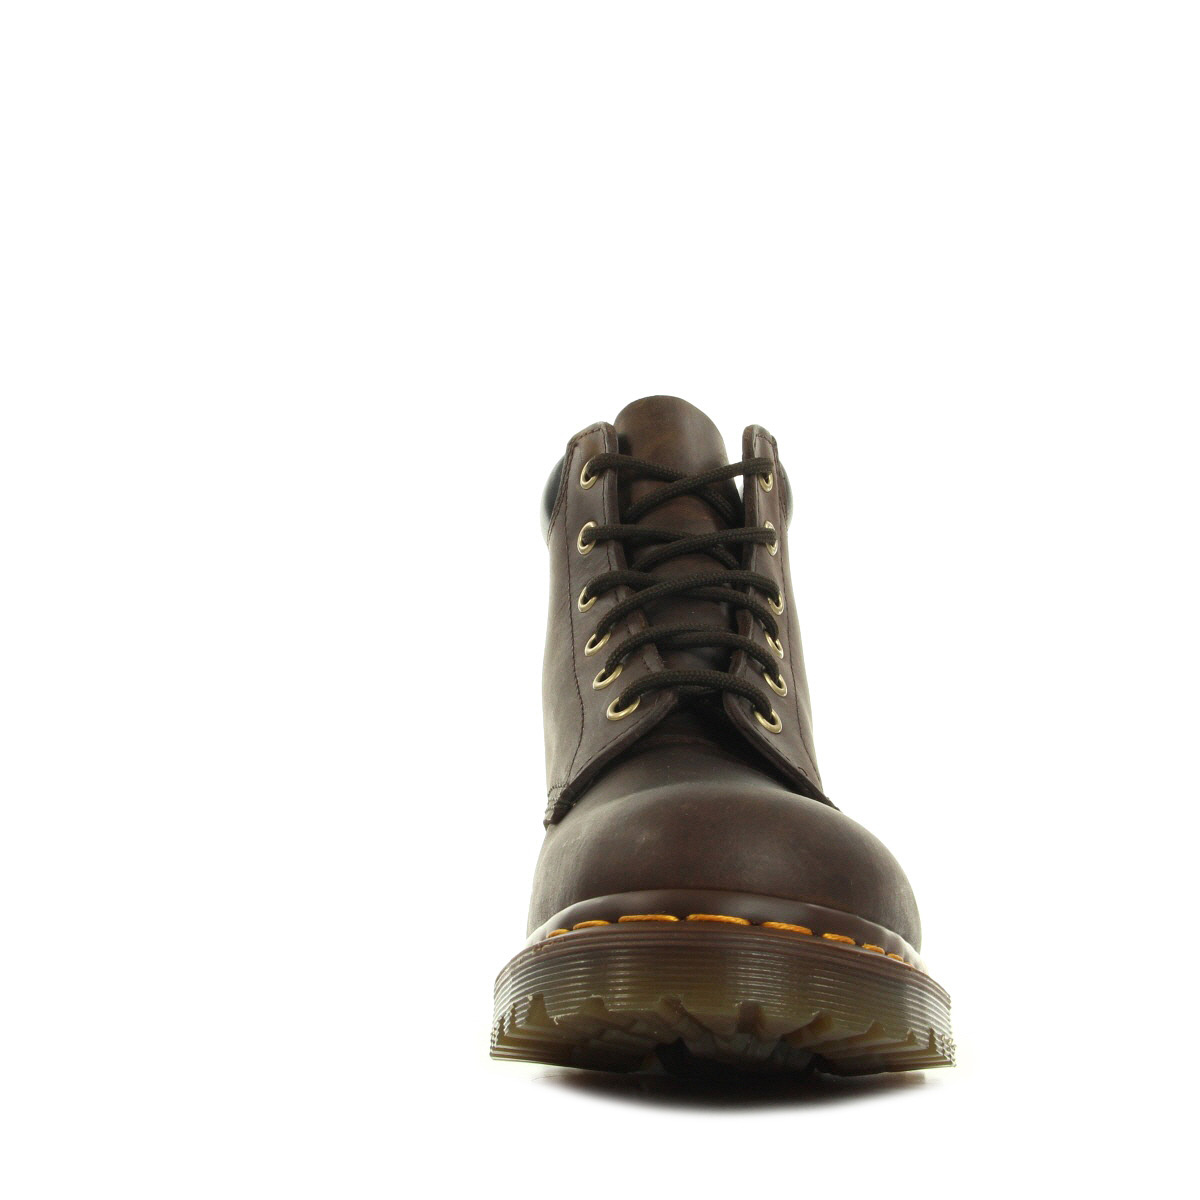 Dr. Martens 939 Ben Boot Crazy Horse Gaucho 11292201, Boots homme